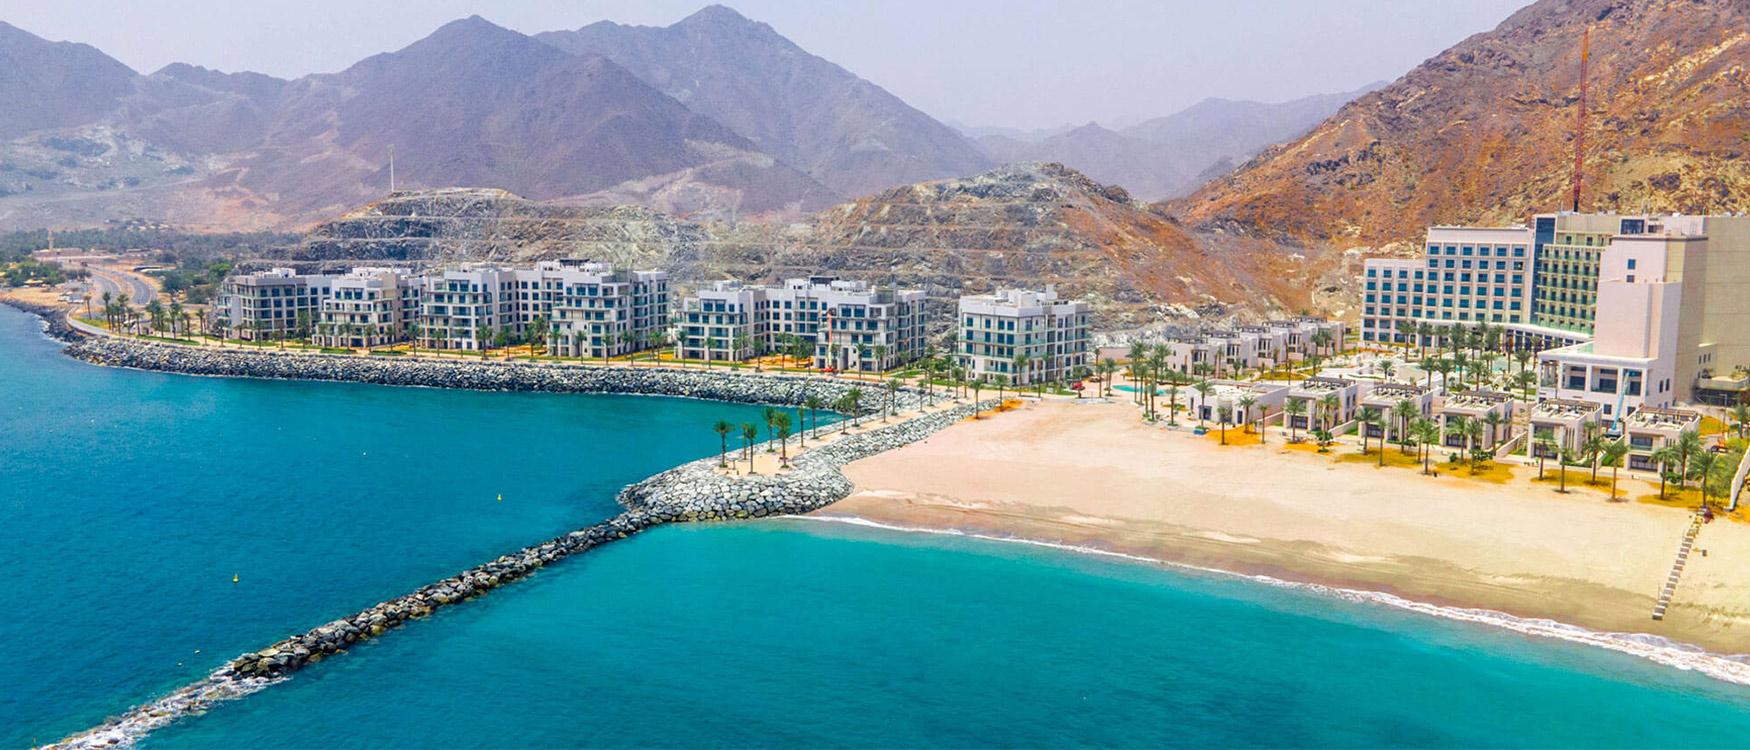 Ready Apartments for Emiratis in Fujairah